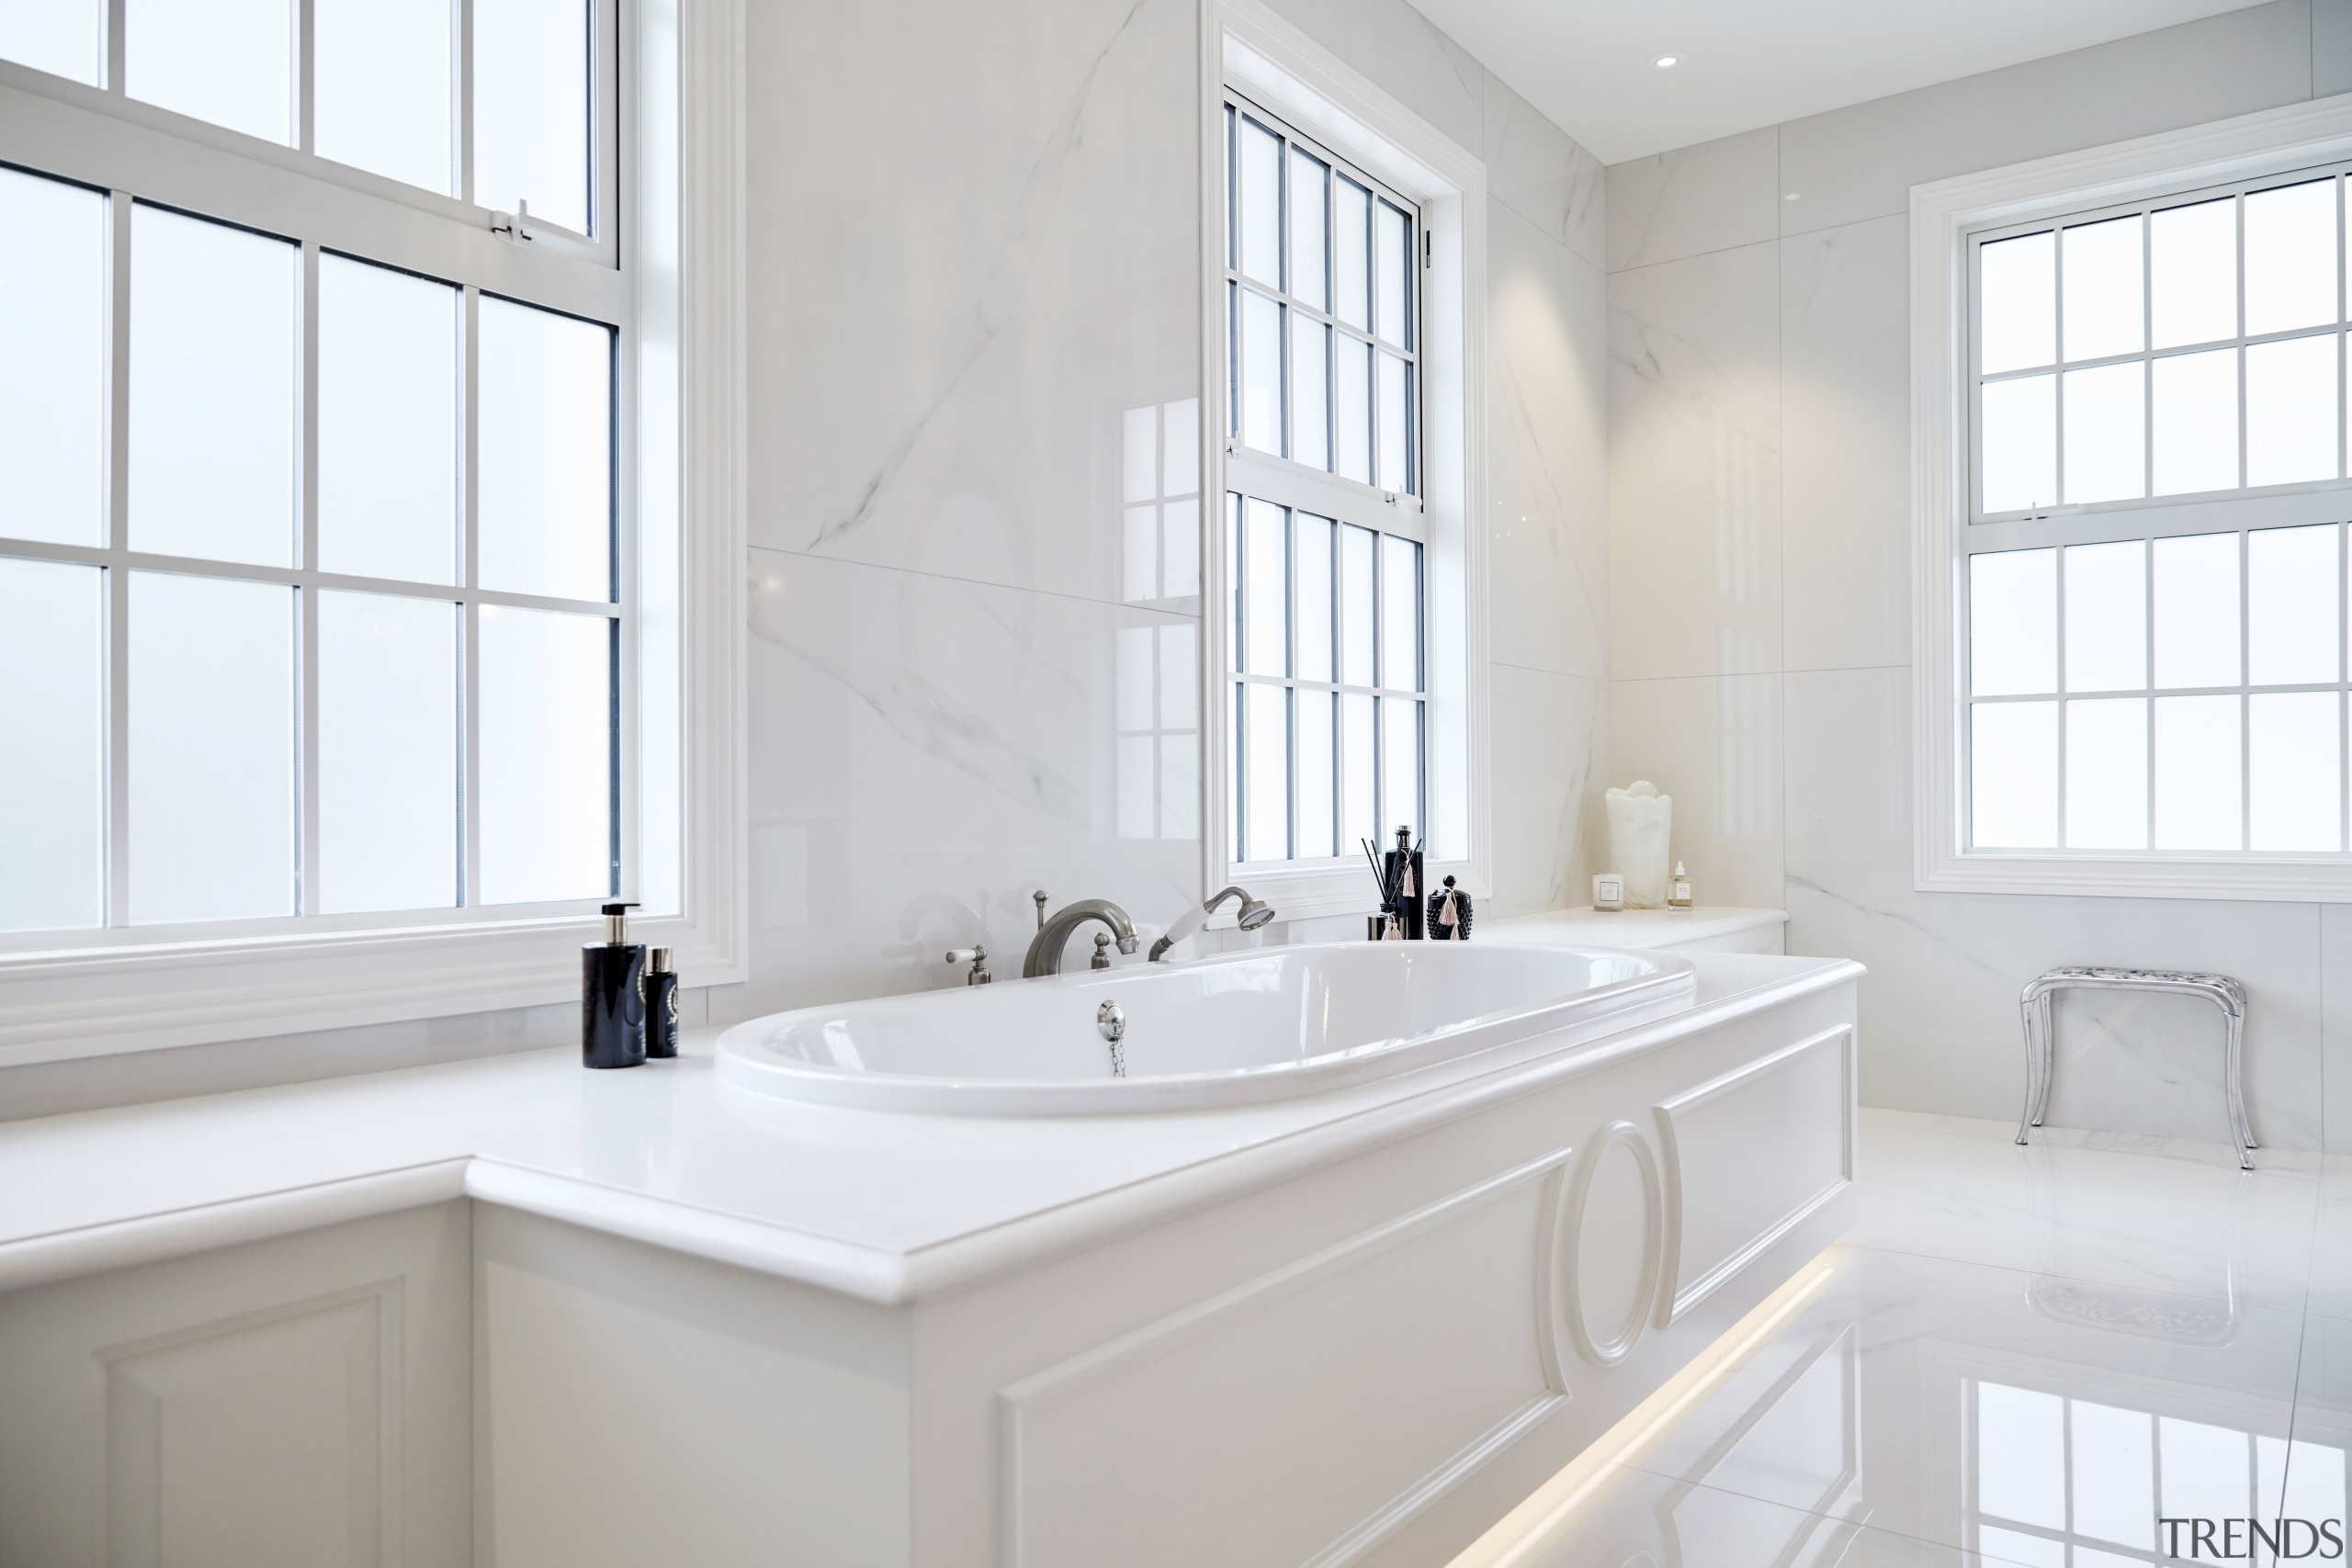 All the elements that make up this ensuite architecture, bathroom, bathroom accessory, bathtub, floor, flooring, furniture, plumbing fixture, sink, tap, tile, white, ingrid geldof design